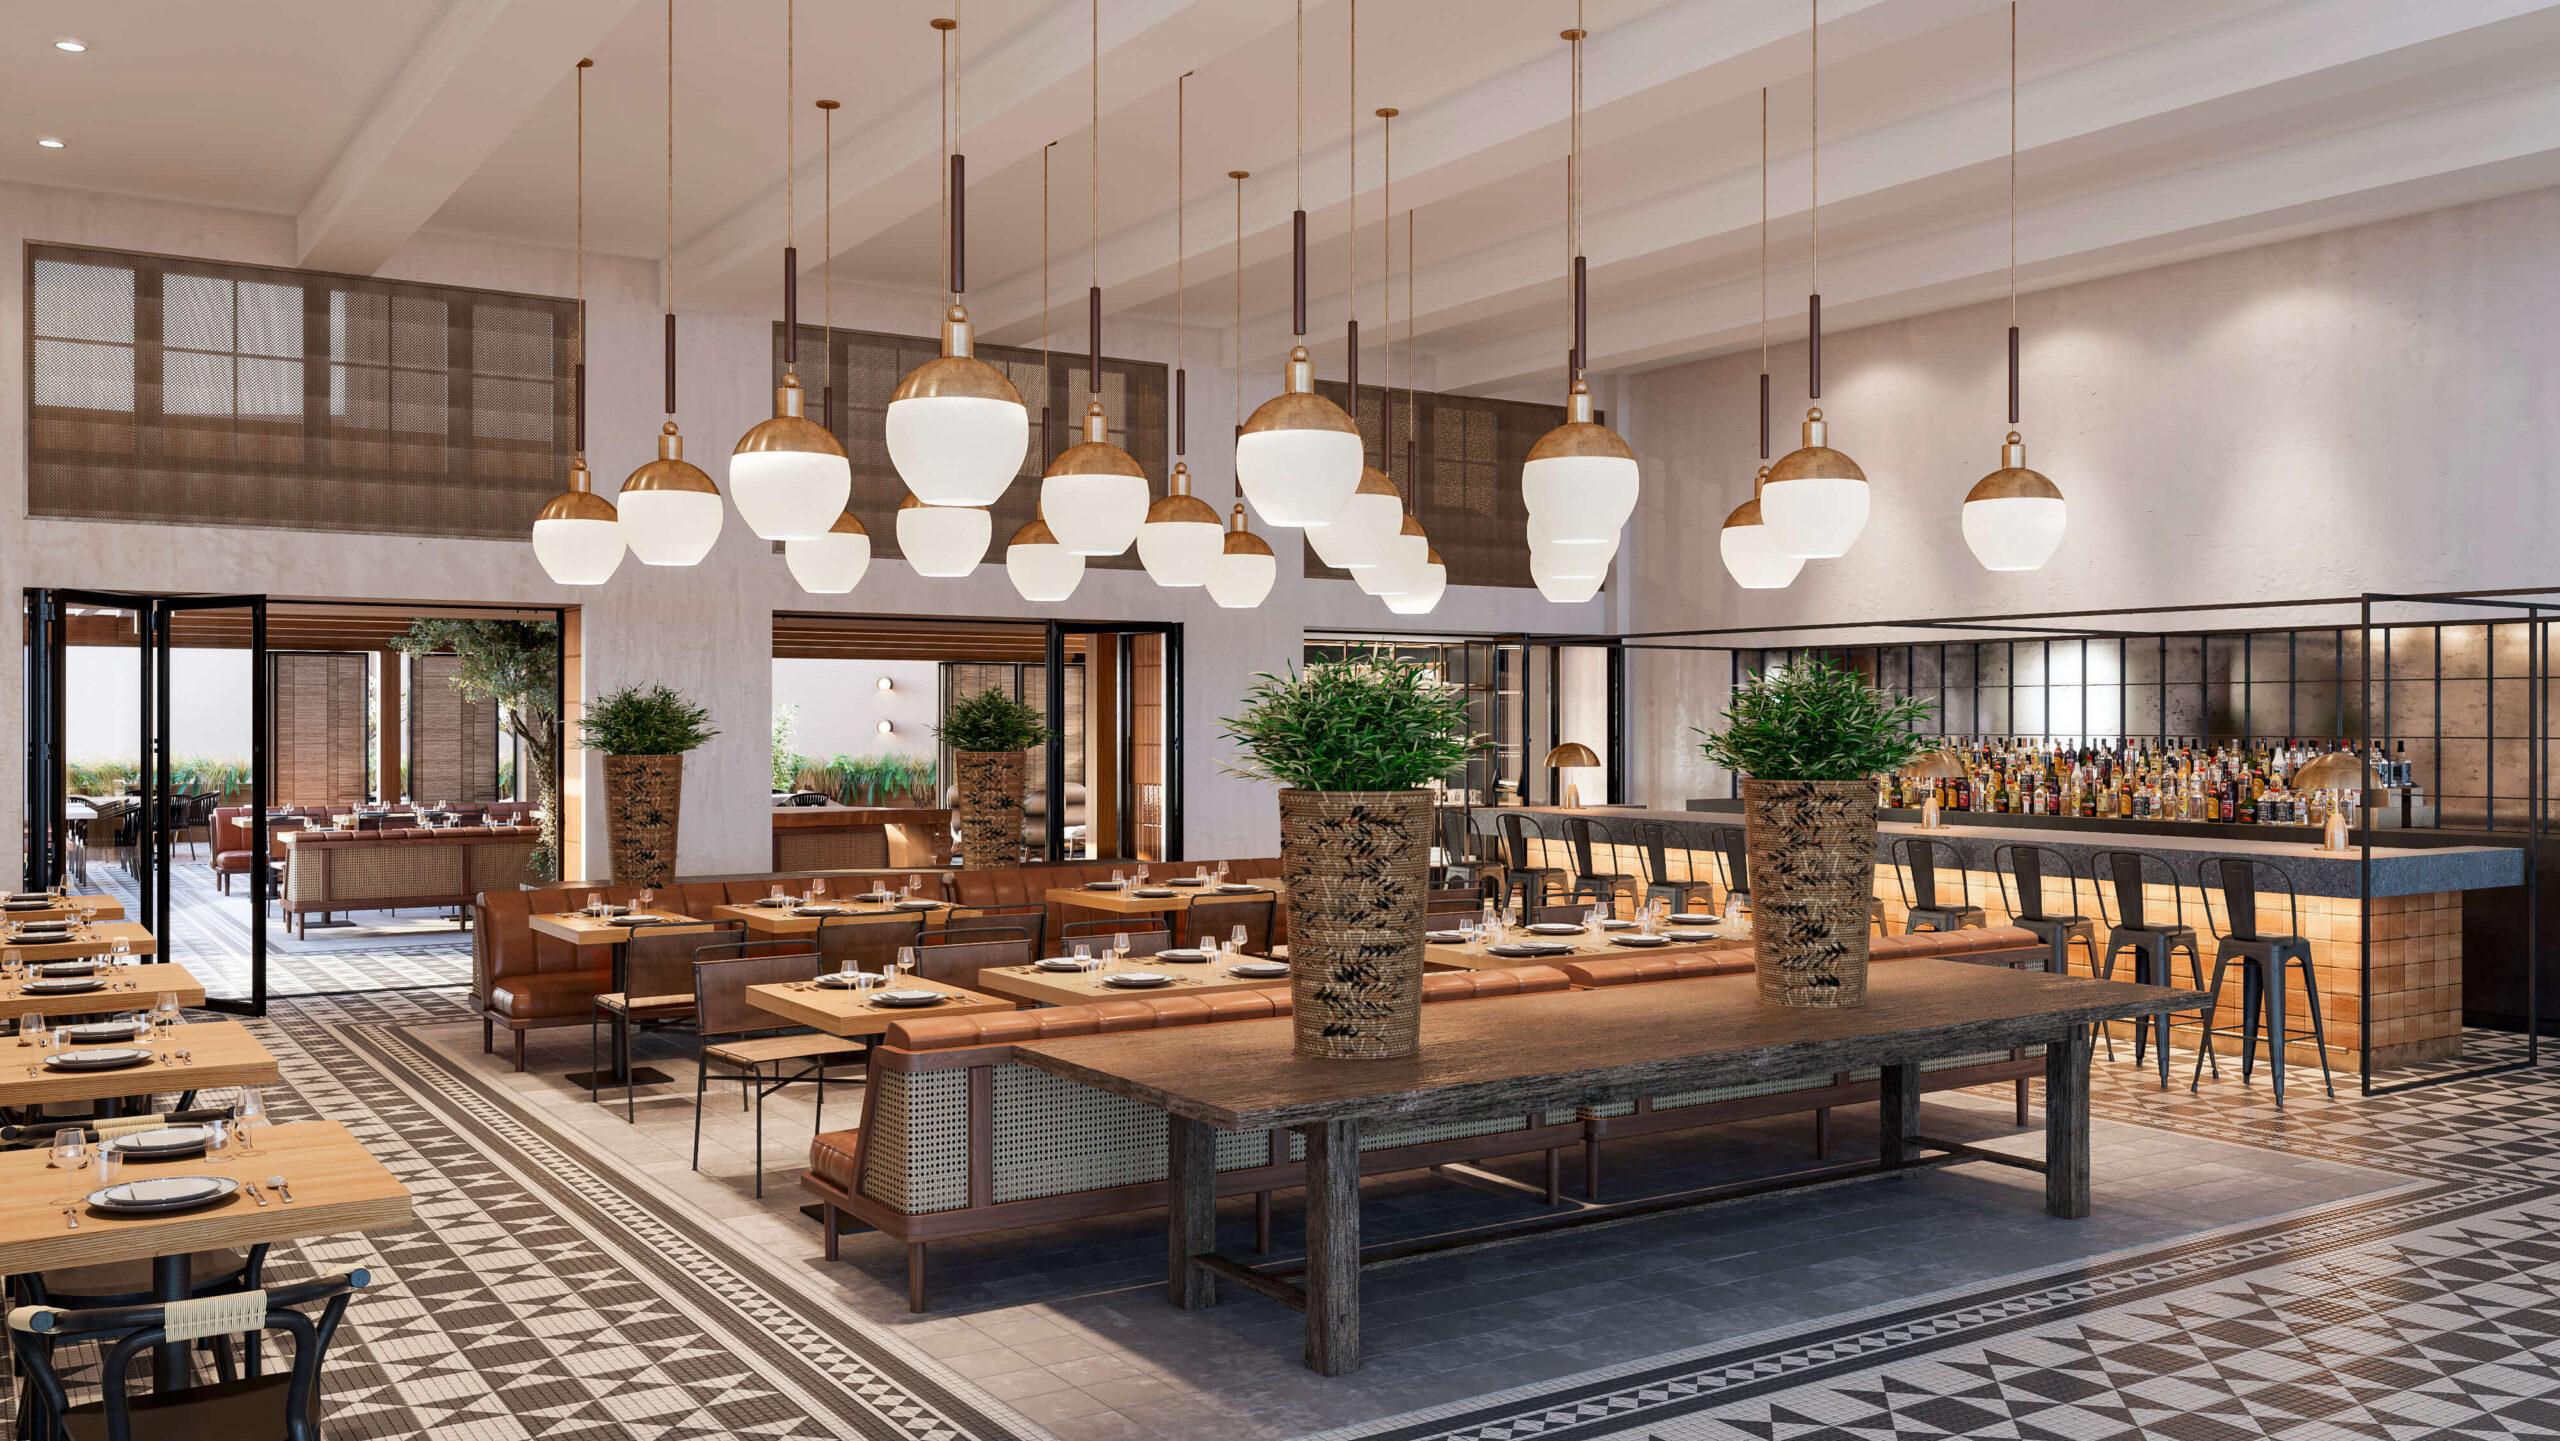 RBS_Vigneron_Exsiting_Building_Renovated_Restaurant